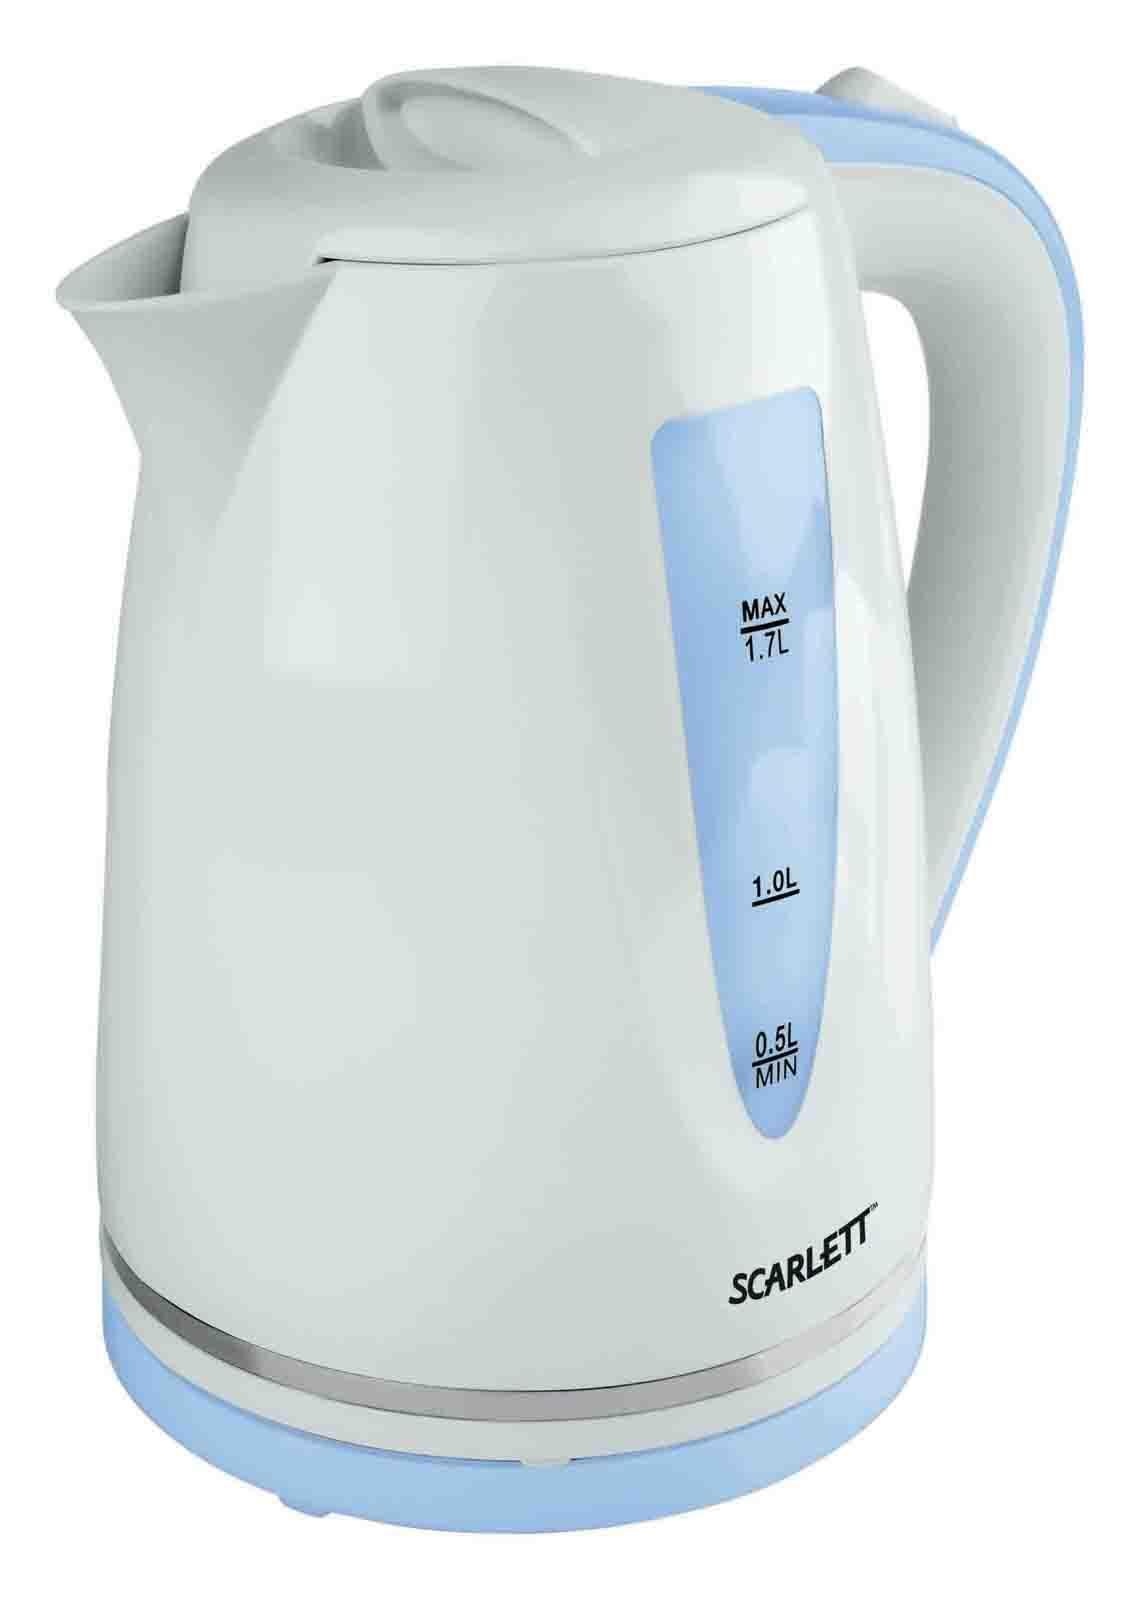 Scarlett SC-EK18P06, White Blue электрический чайник